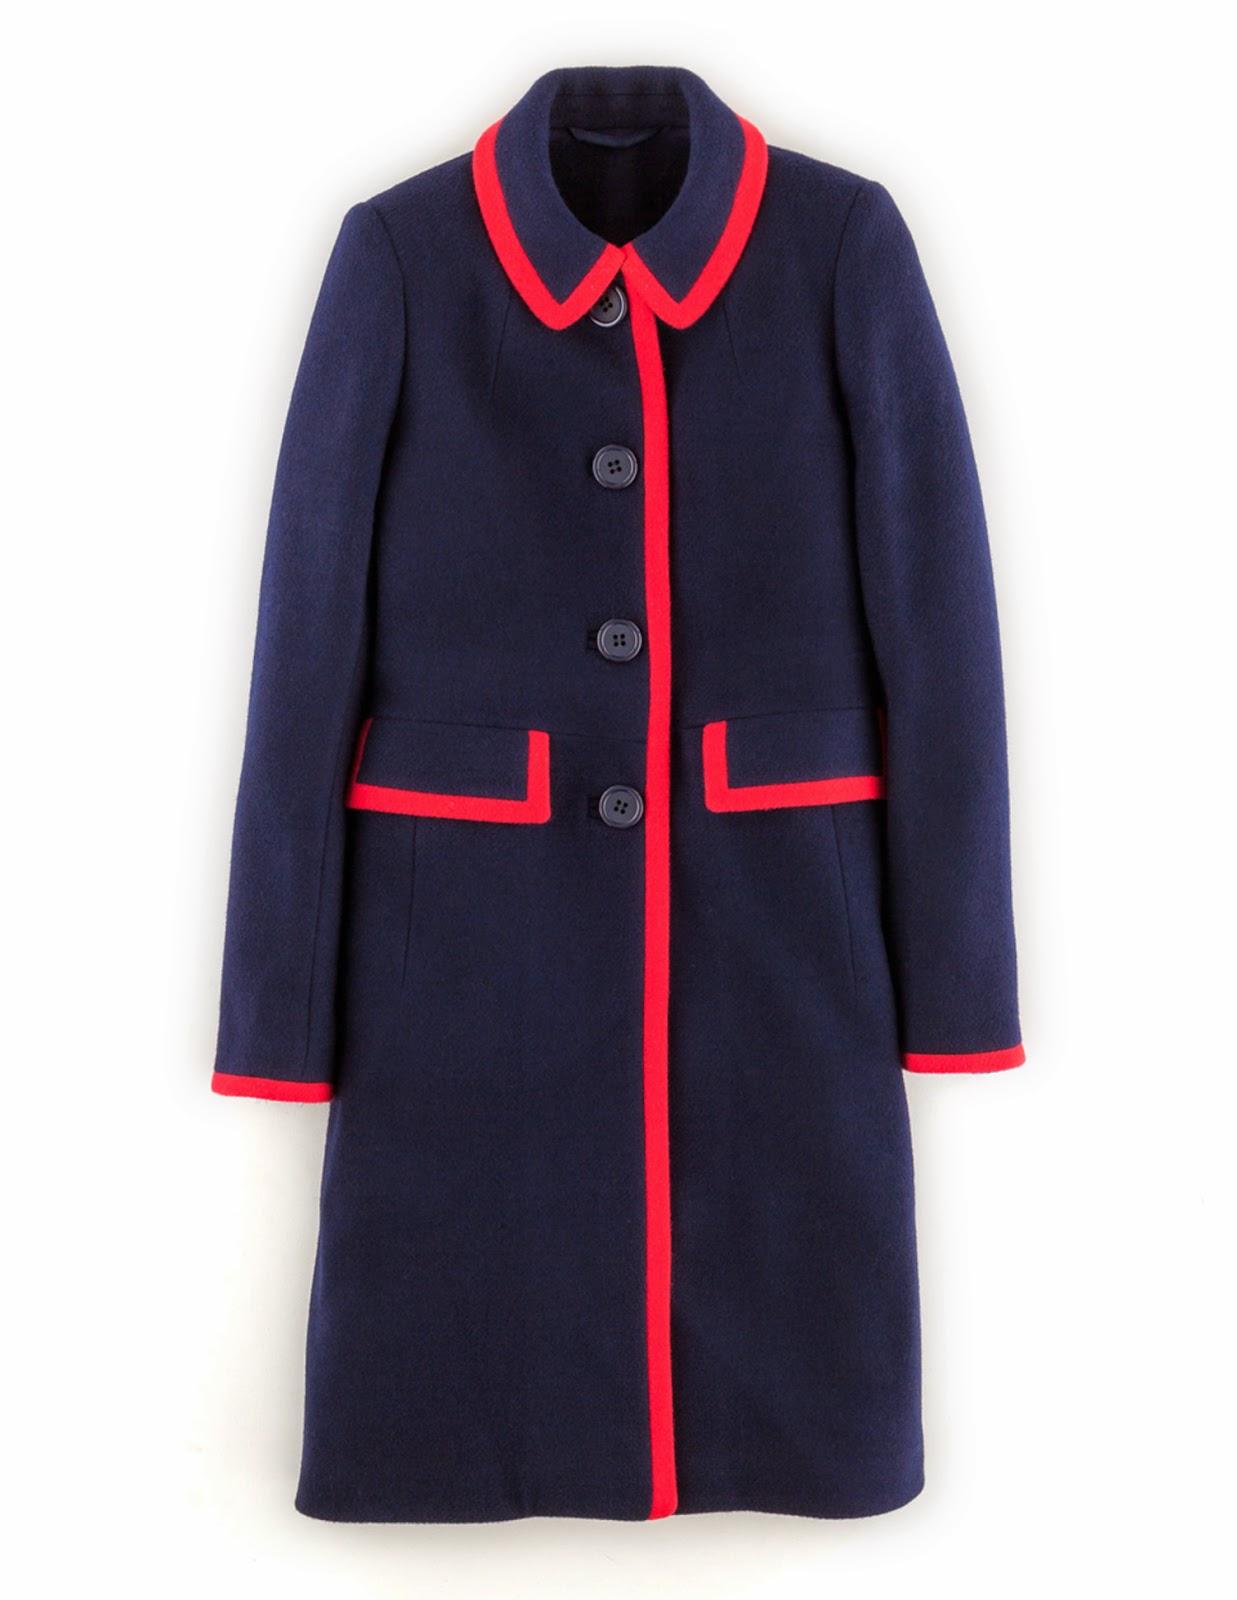 http://www.boden.co.uk/en-GB/Womens-Coats-Jackets/WE460-NAV/Womens-Navy-Red-Kate-Coat.html